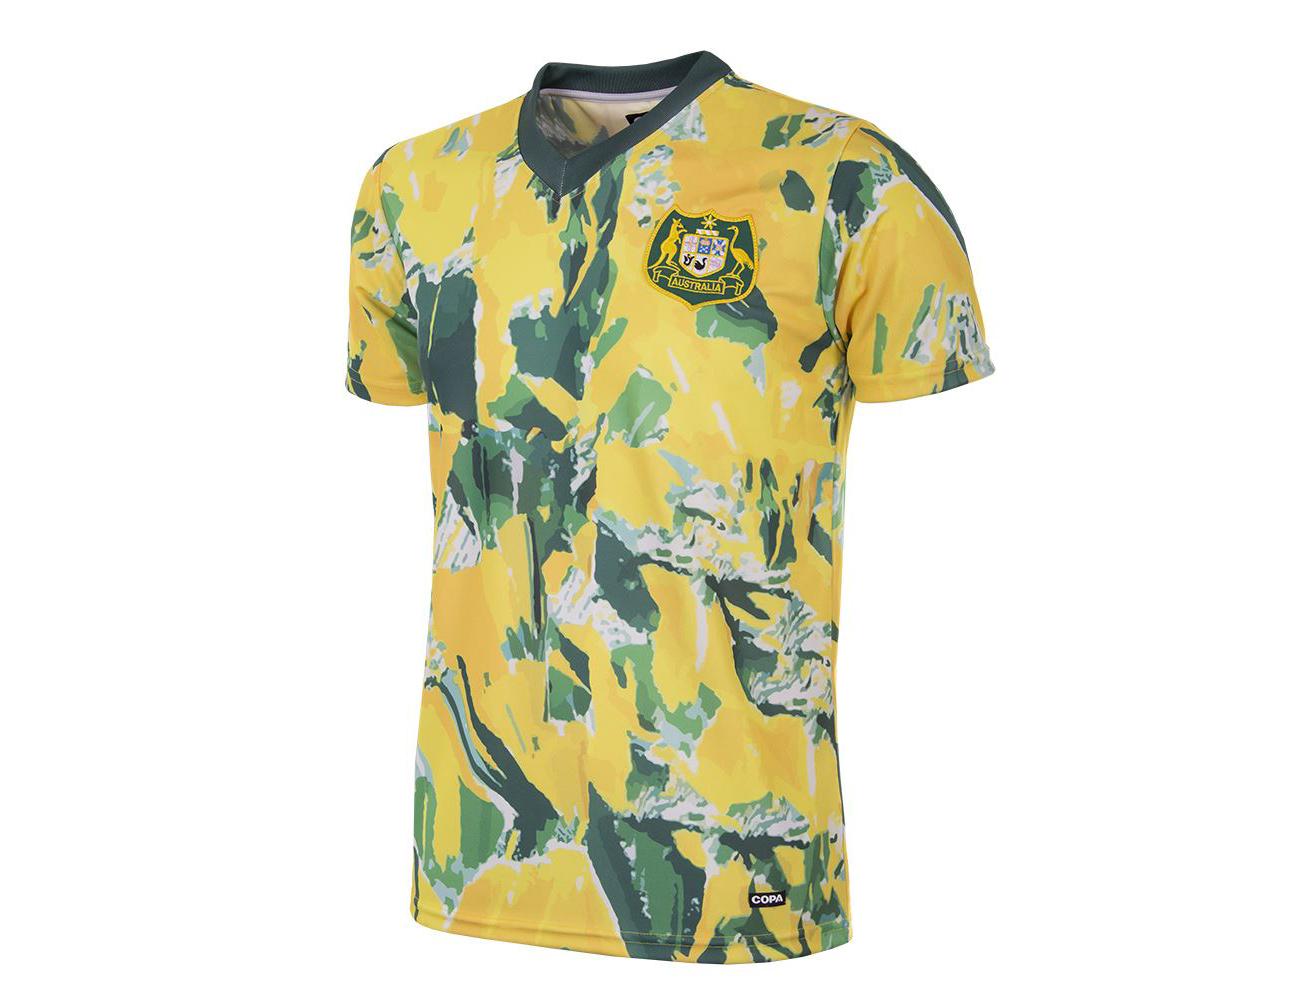 Australia-1990-93-Short-Sleeve-Retro-Football-Shirt-y-4170